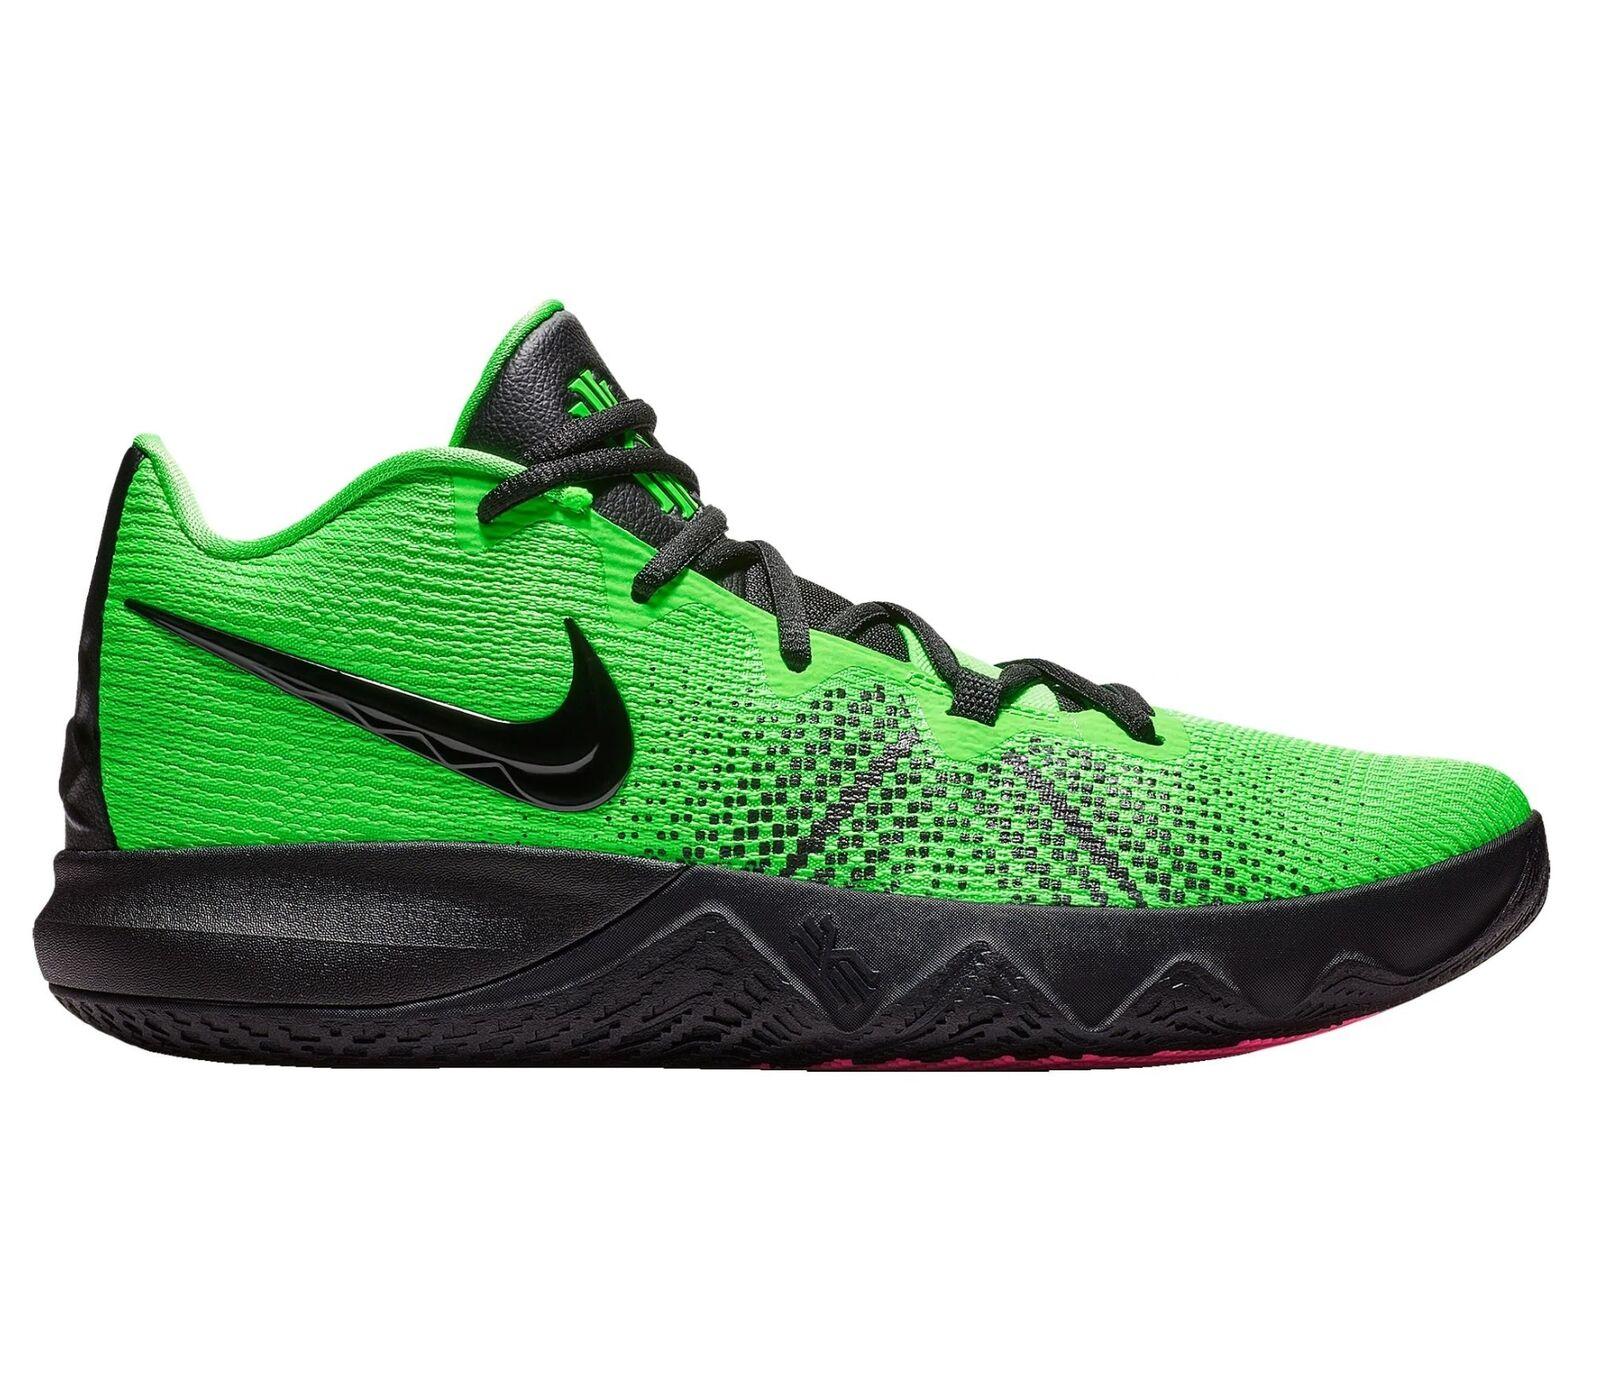 Nike kyrie - fliegenfalle mens - aa7071-300 wut grüne schwarze basketball - mens schuhe der größe 10,5 65a681